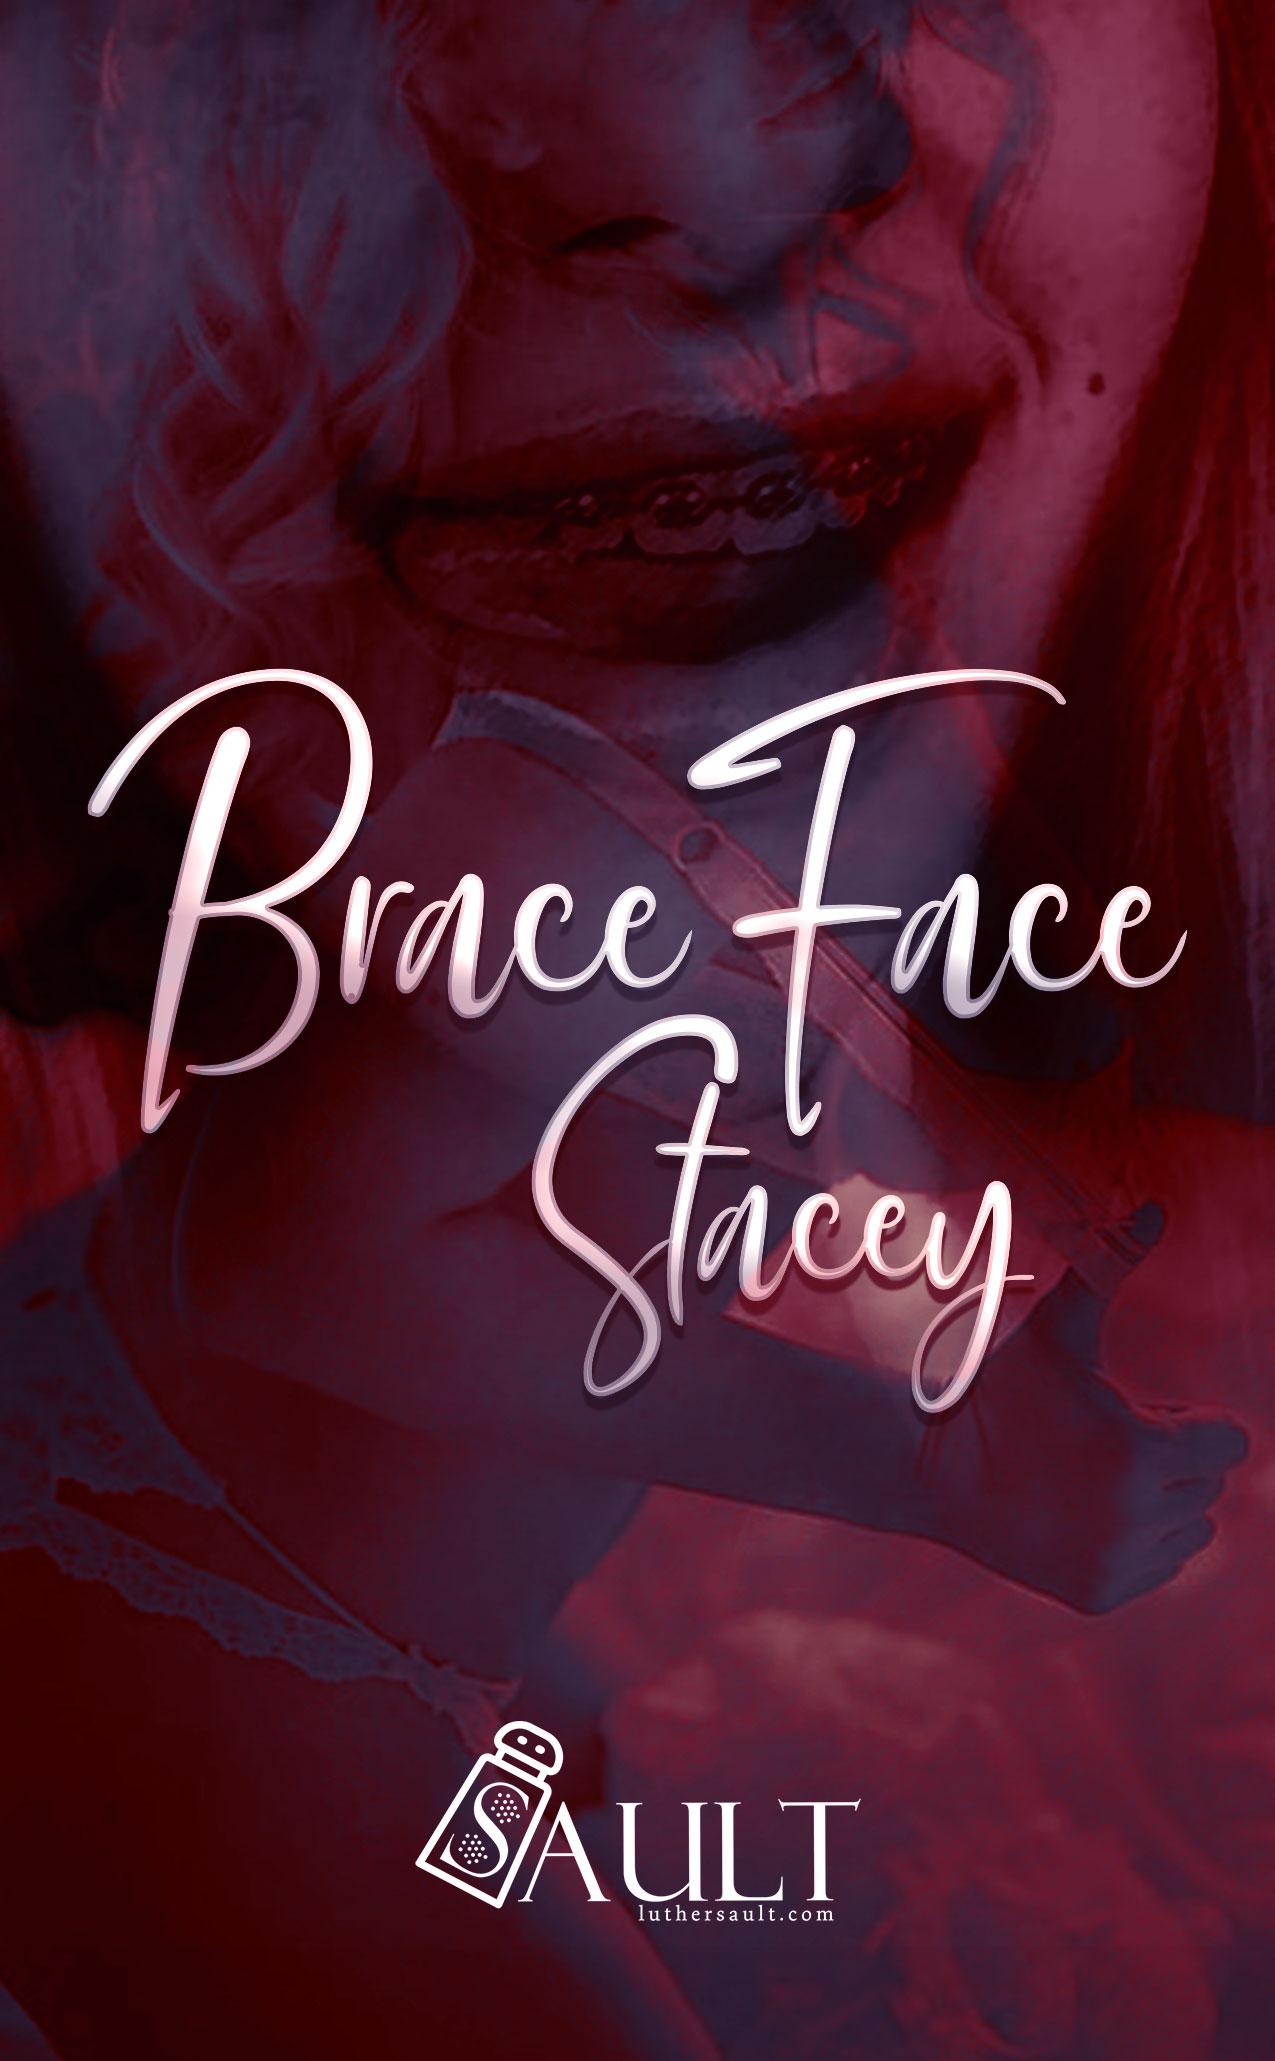 Braced Faced Stacy, Original Cover 2